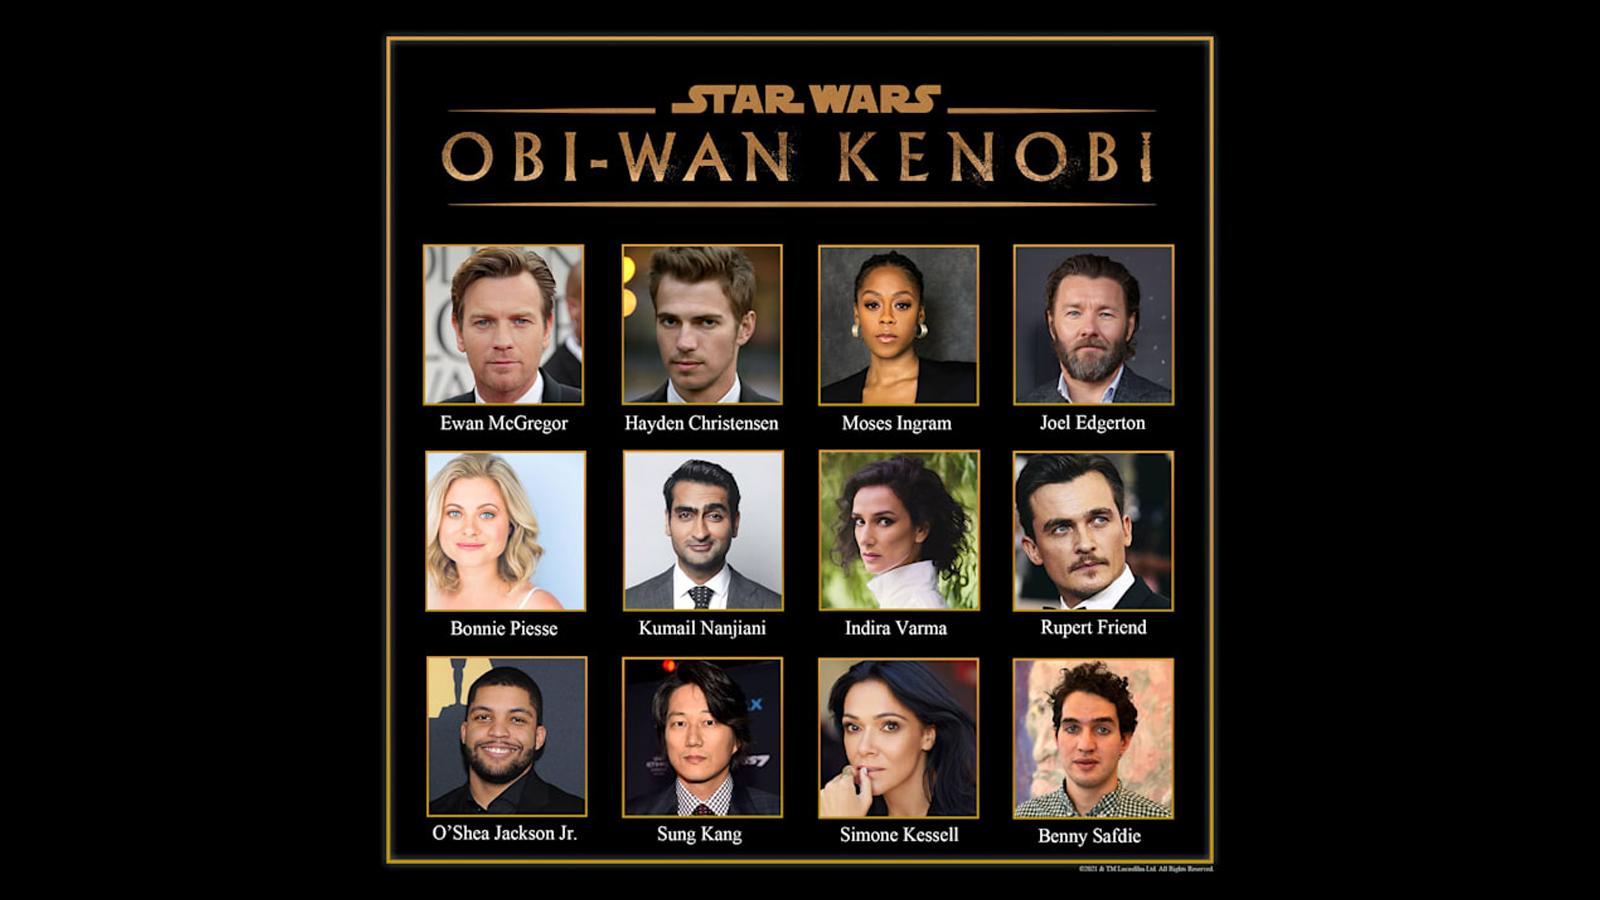 Cast of the upcoming 'Obi-Wan Kenobi' show